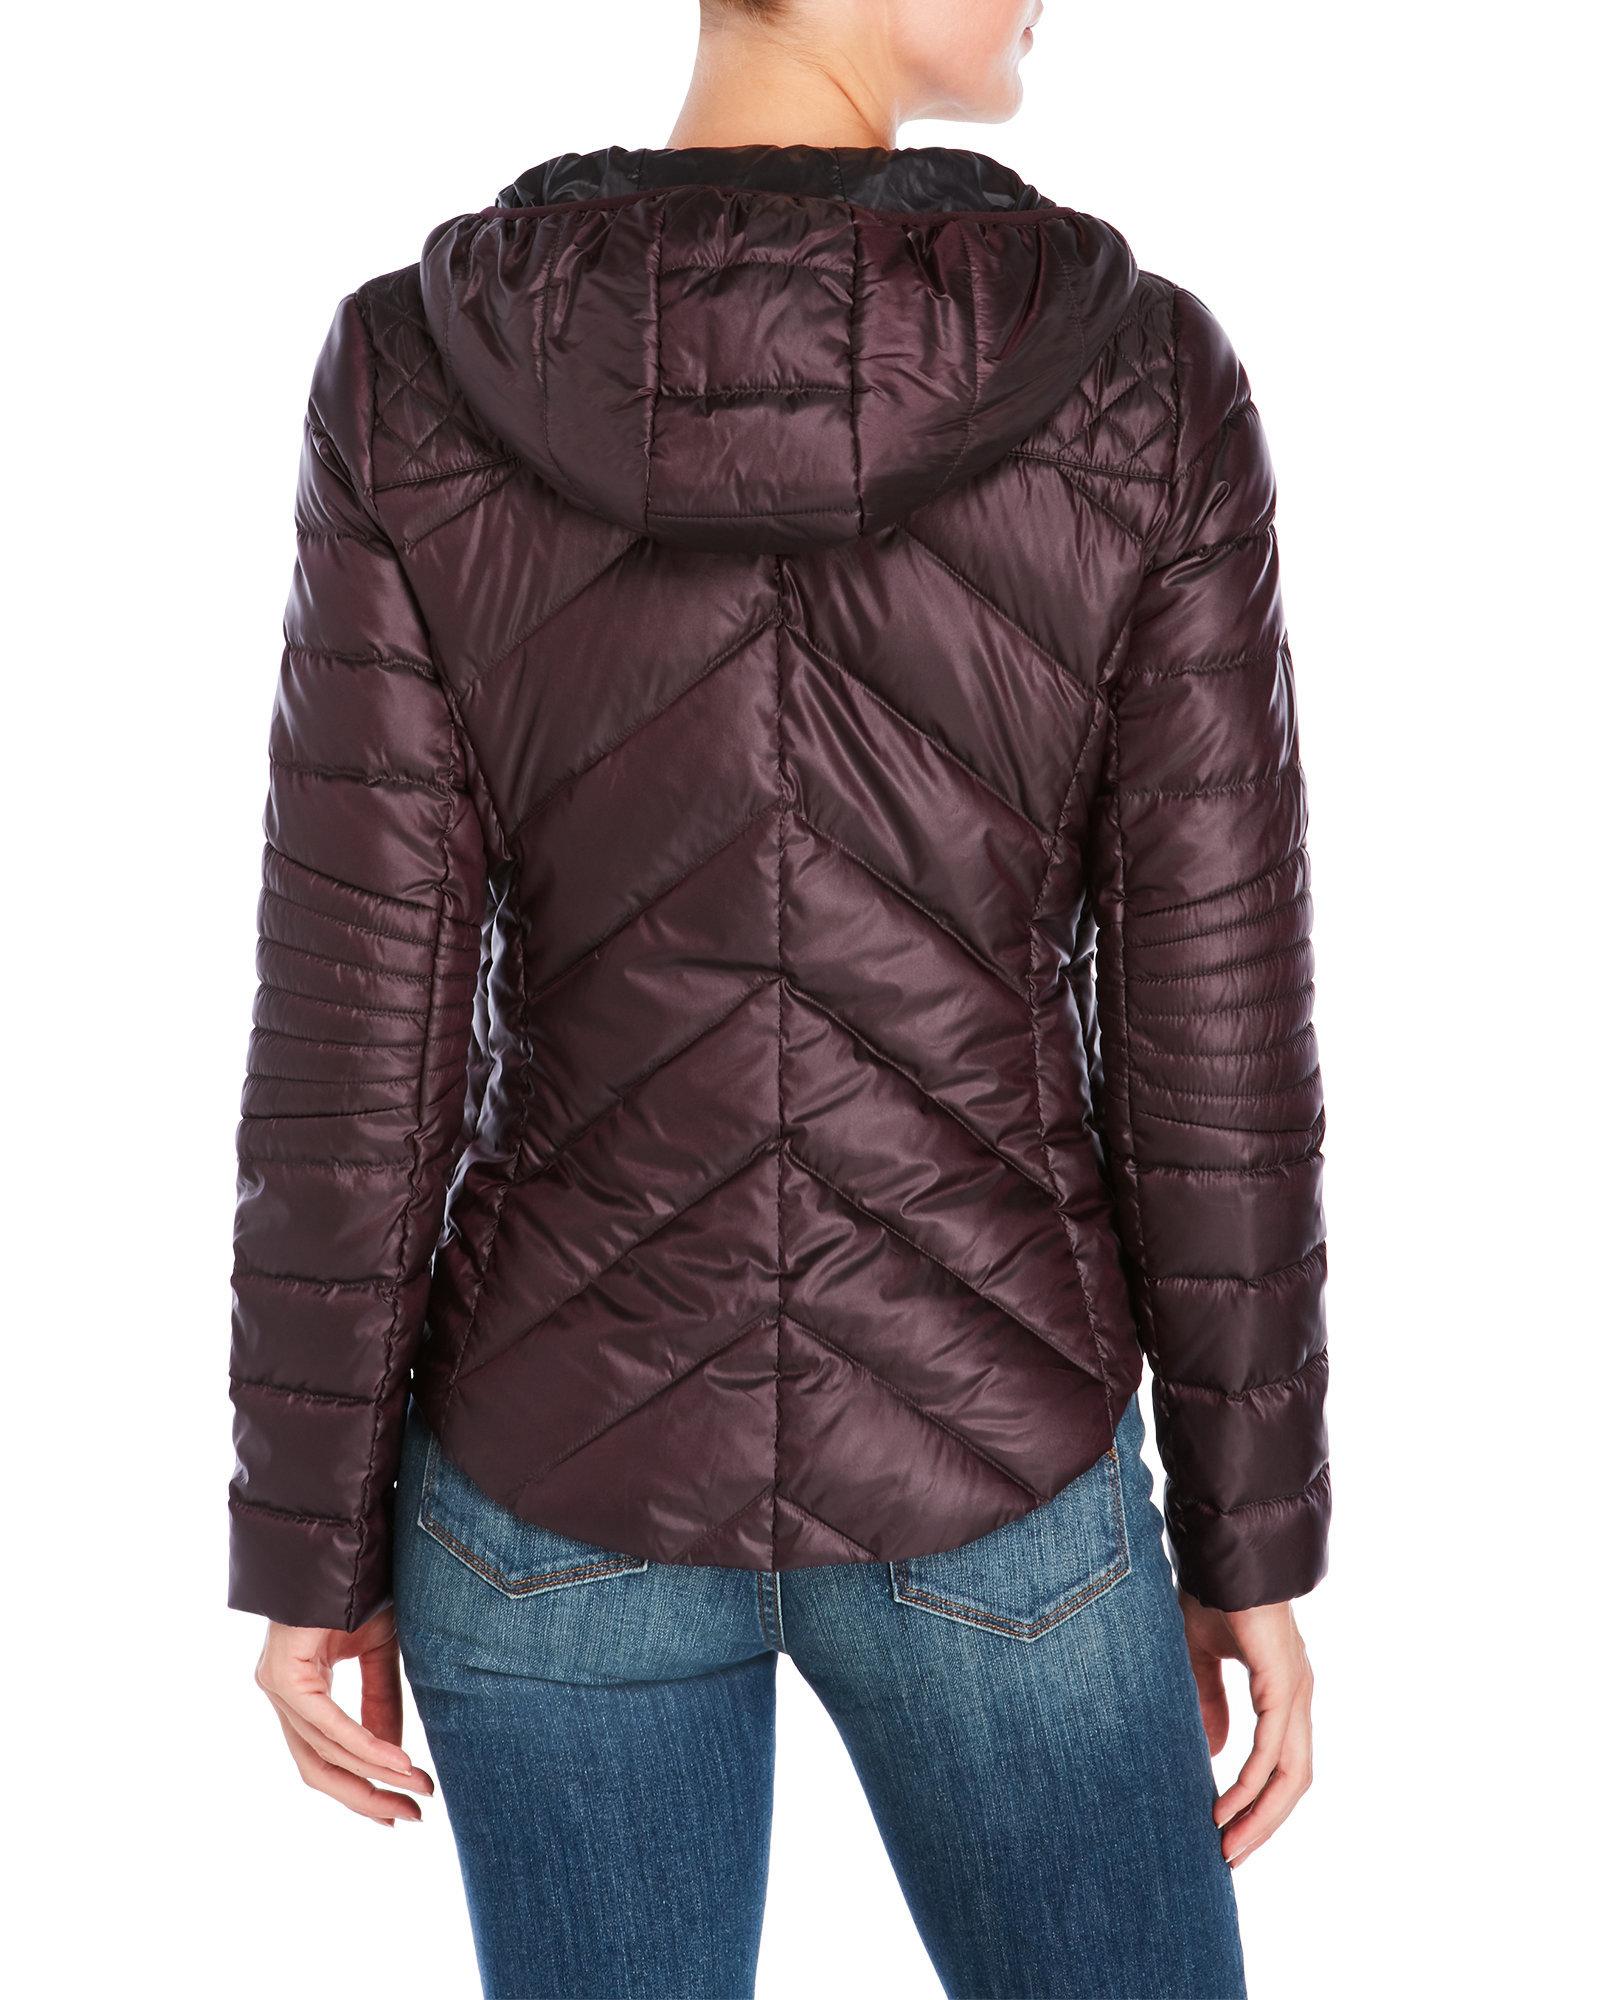 Bcbgeneration Hooded Ultra Lightweight Packable Down Coat